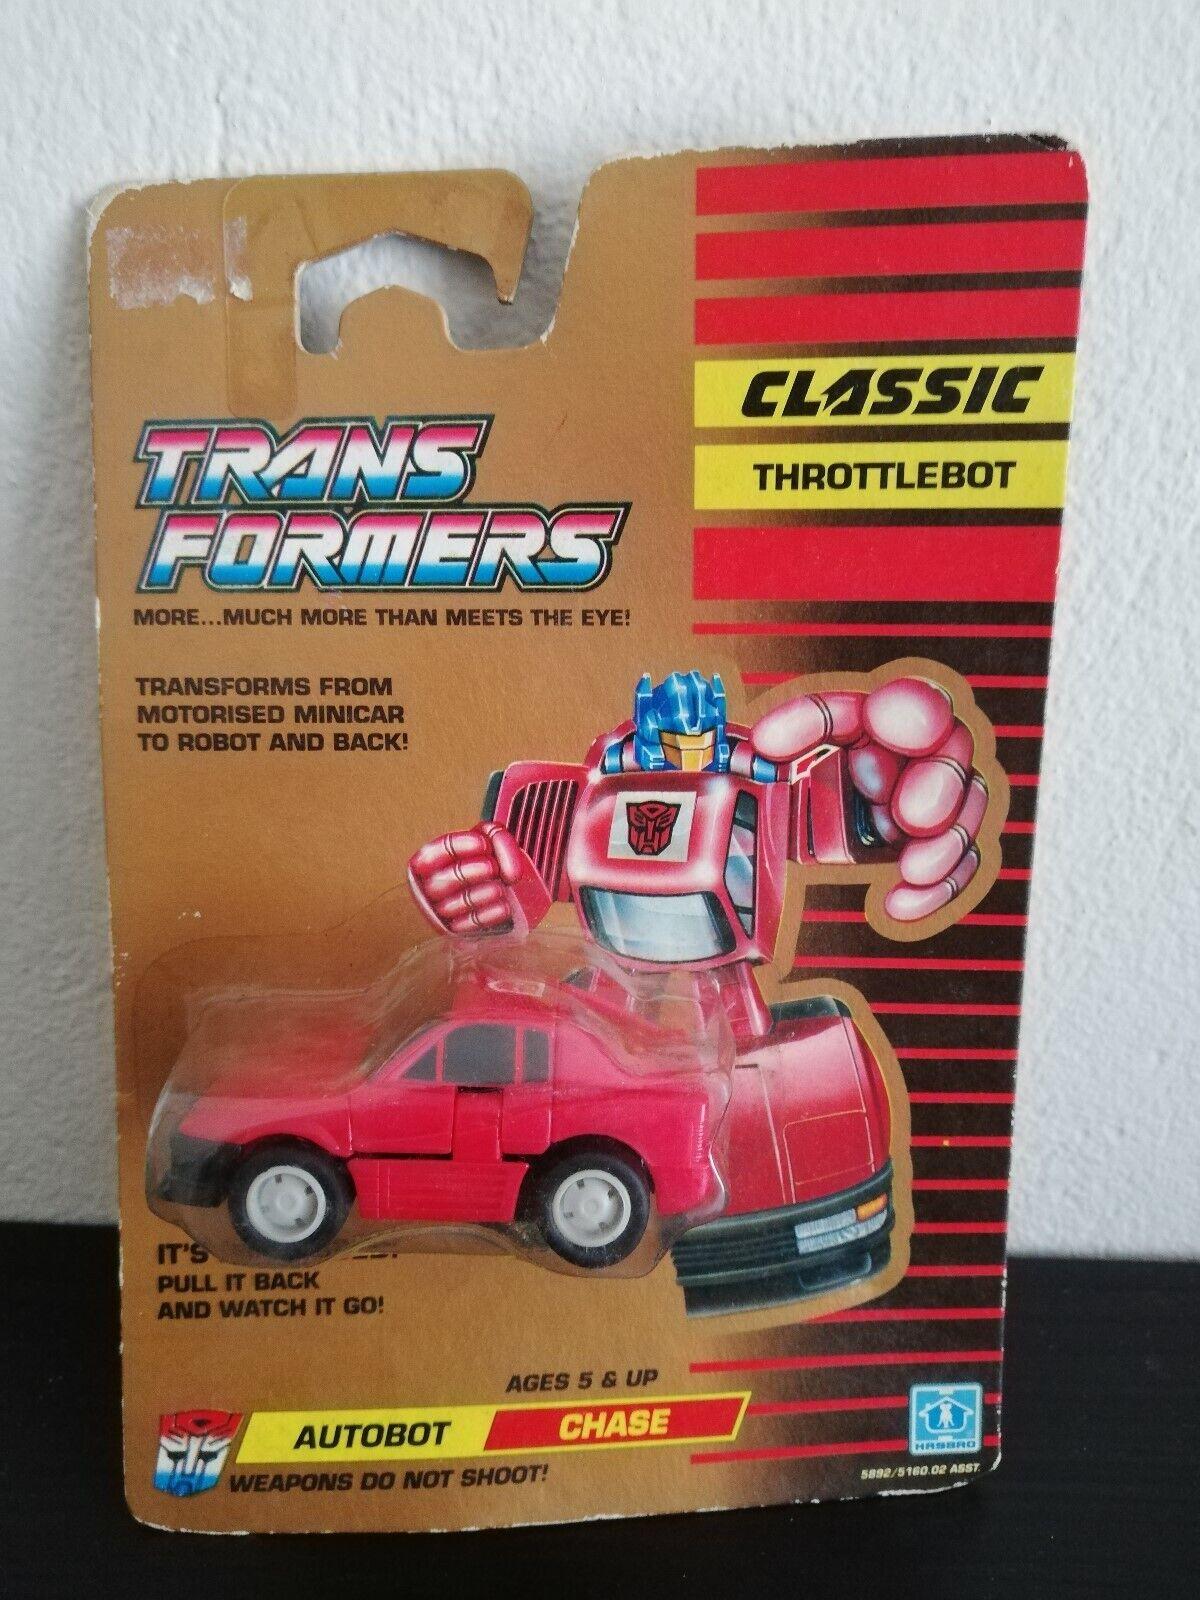 Vintage Transformers G1 Clásico Throjotlebot Autobot Chase difícil encontrar 1990 menta en tarjeta